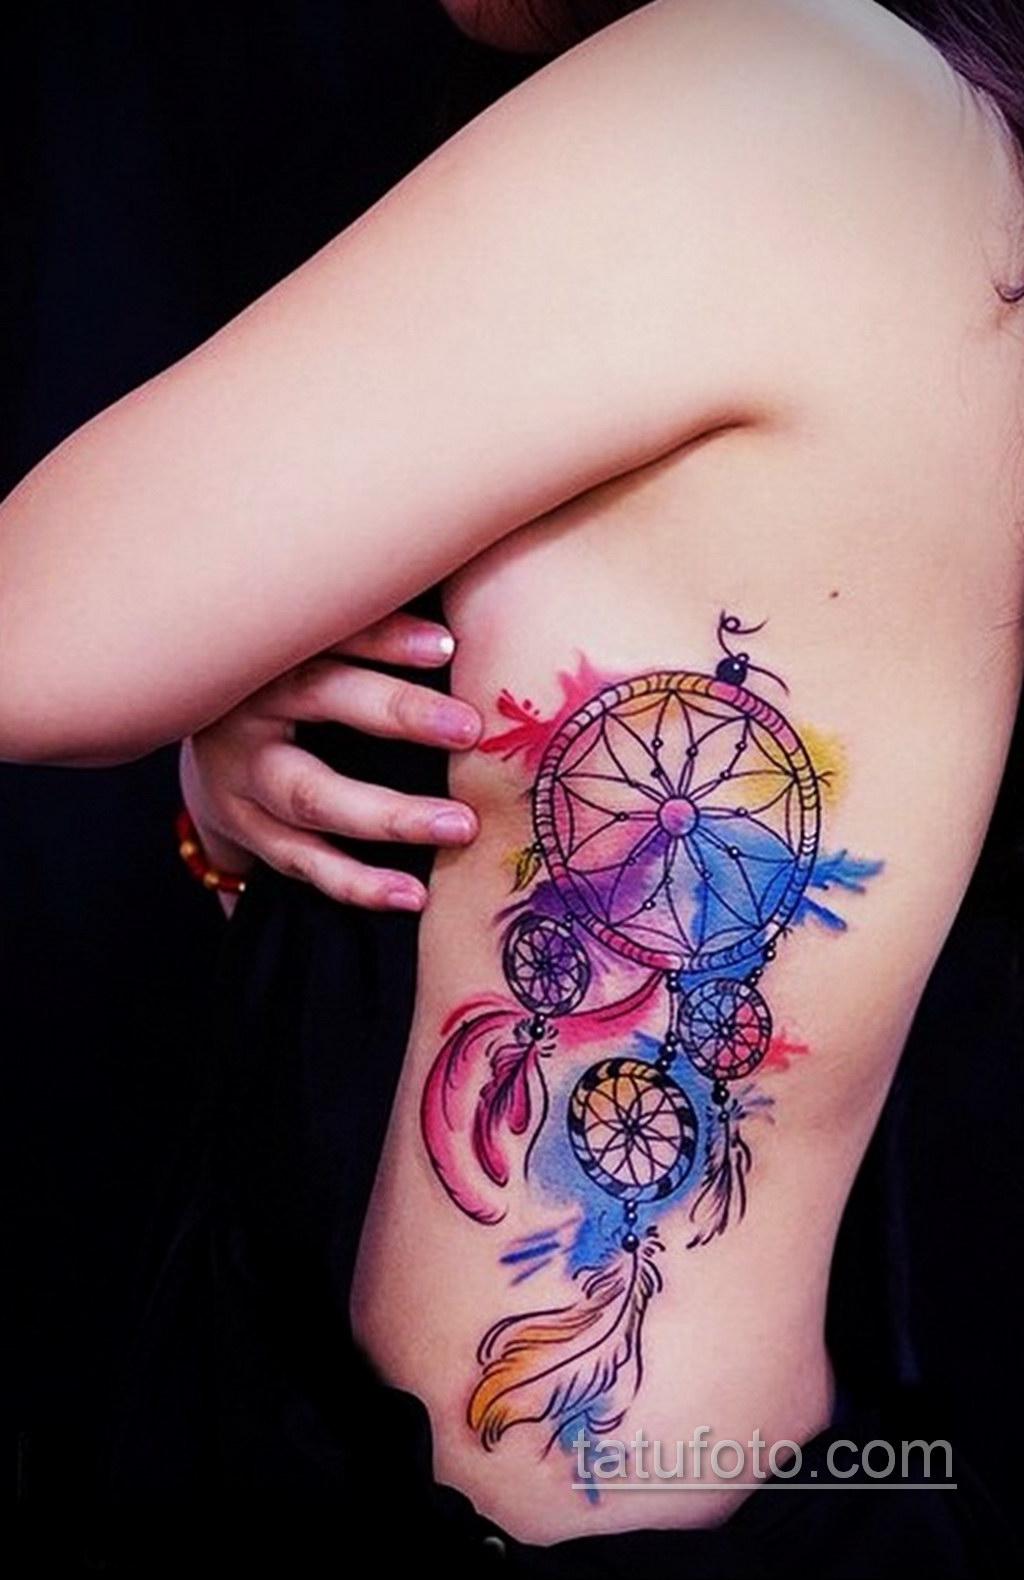 Фото рисунка тату с ловцом снов 22.11.2020 №468 -Dreamcatcher tattoo- tatufoto.com